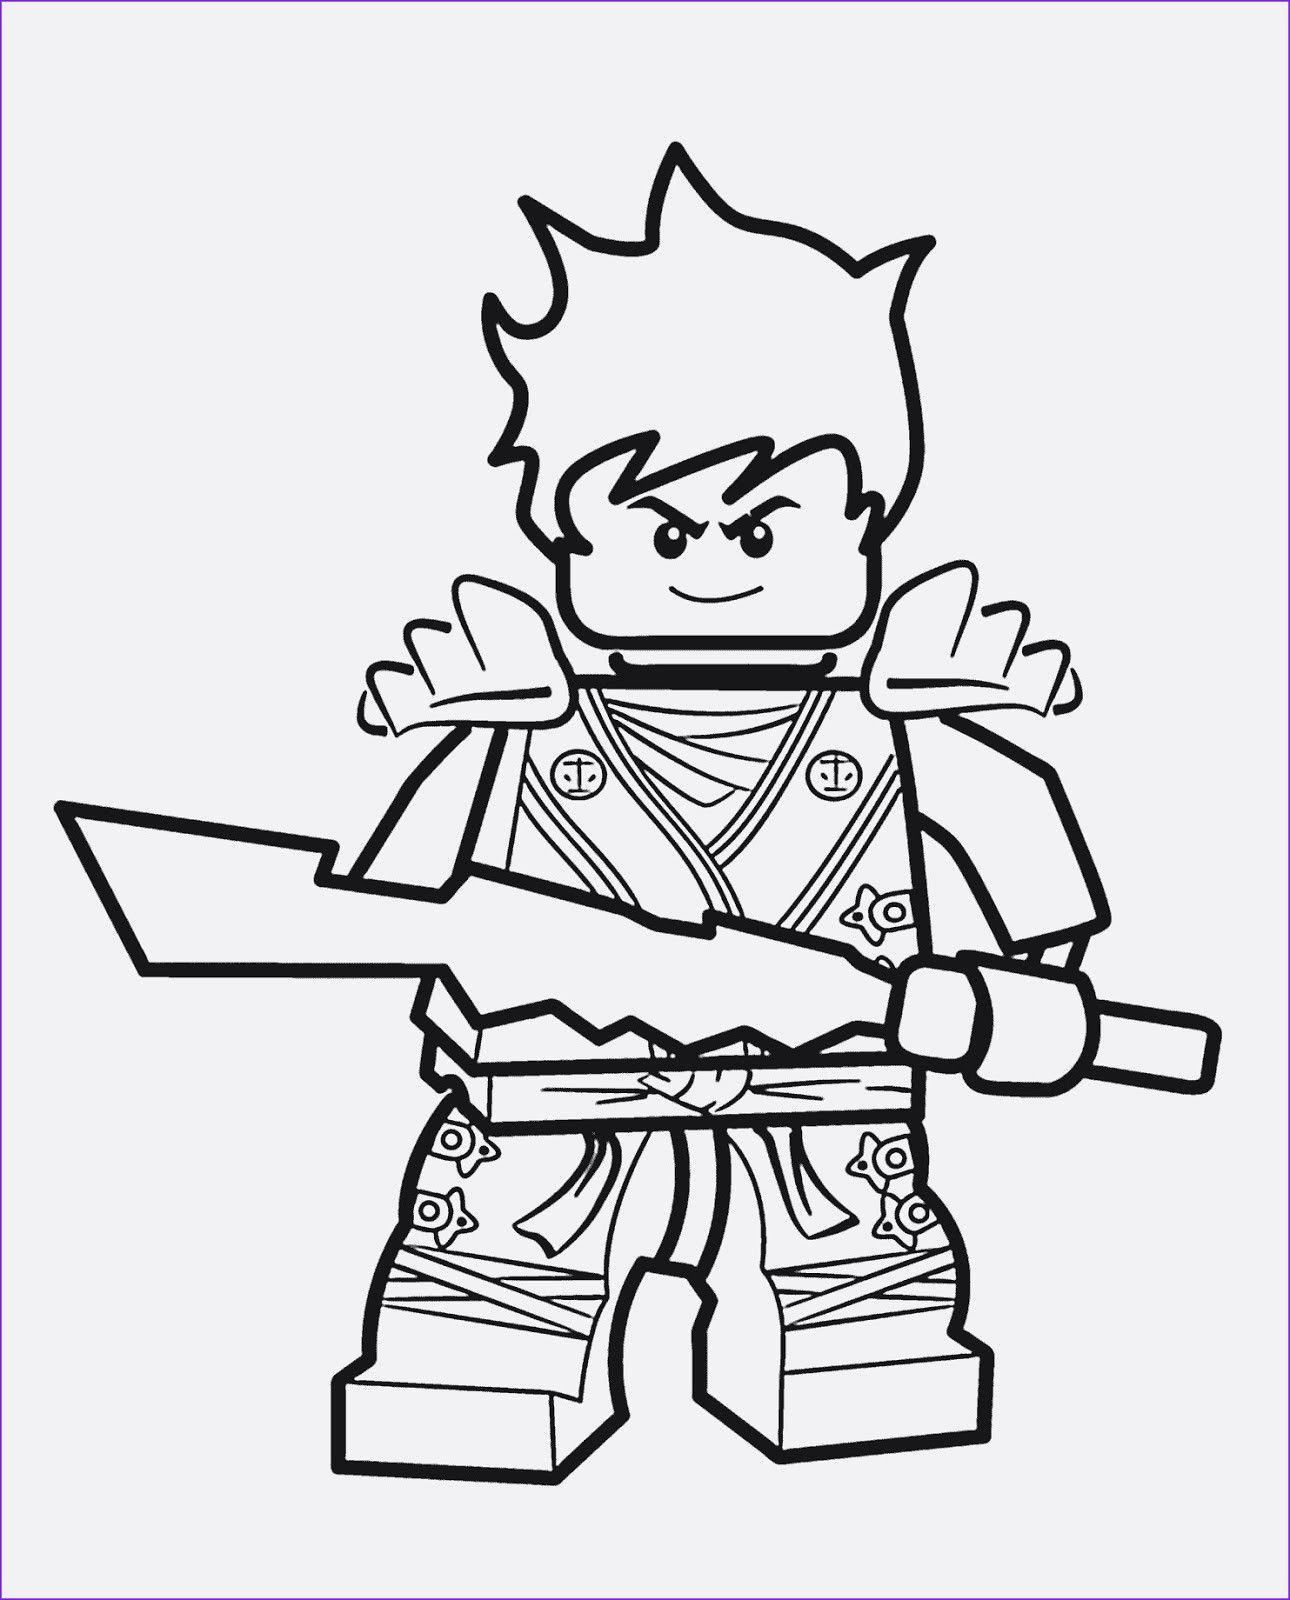 Ausmalbilder Ninjago Lego Ninjago Zum Ninjago Coloring Pages Lego Coloring Coloring Pages